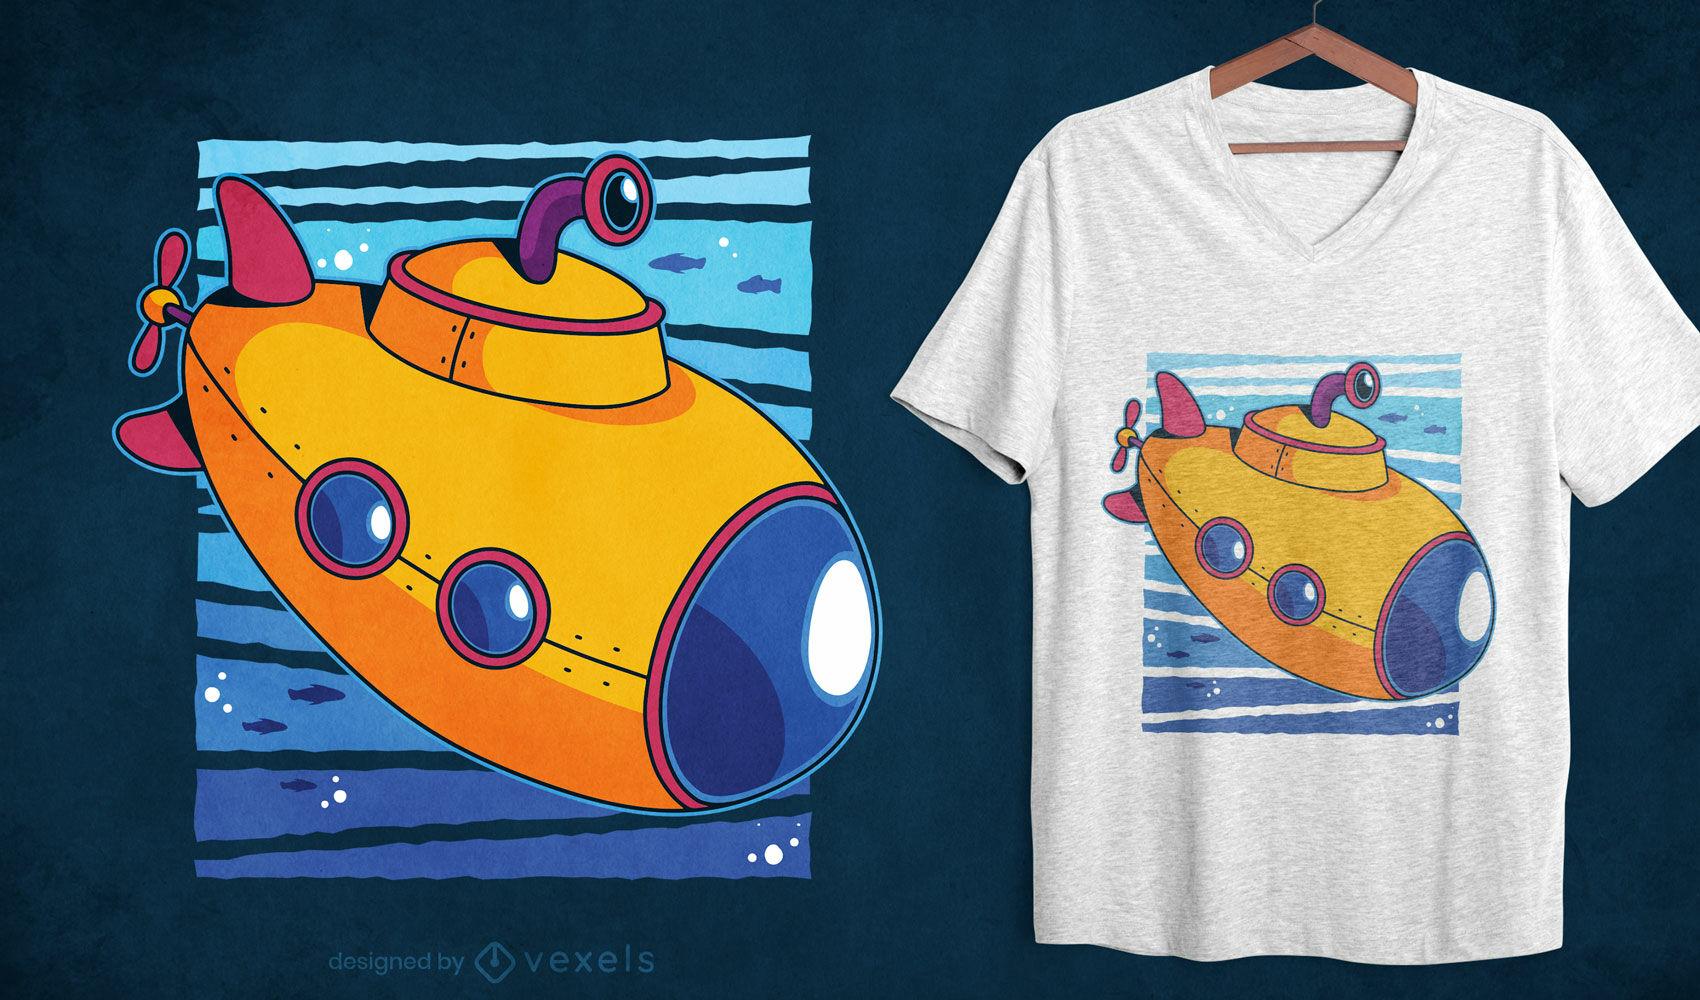 Toy submarine ocean cartoon t-shirt design